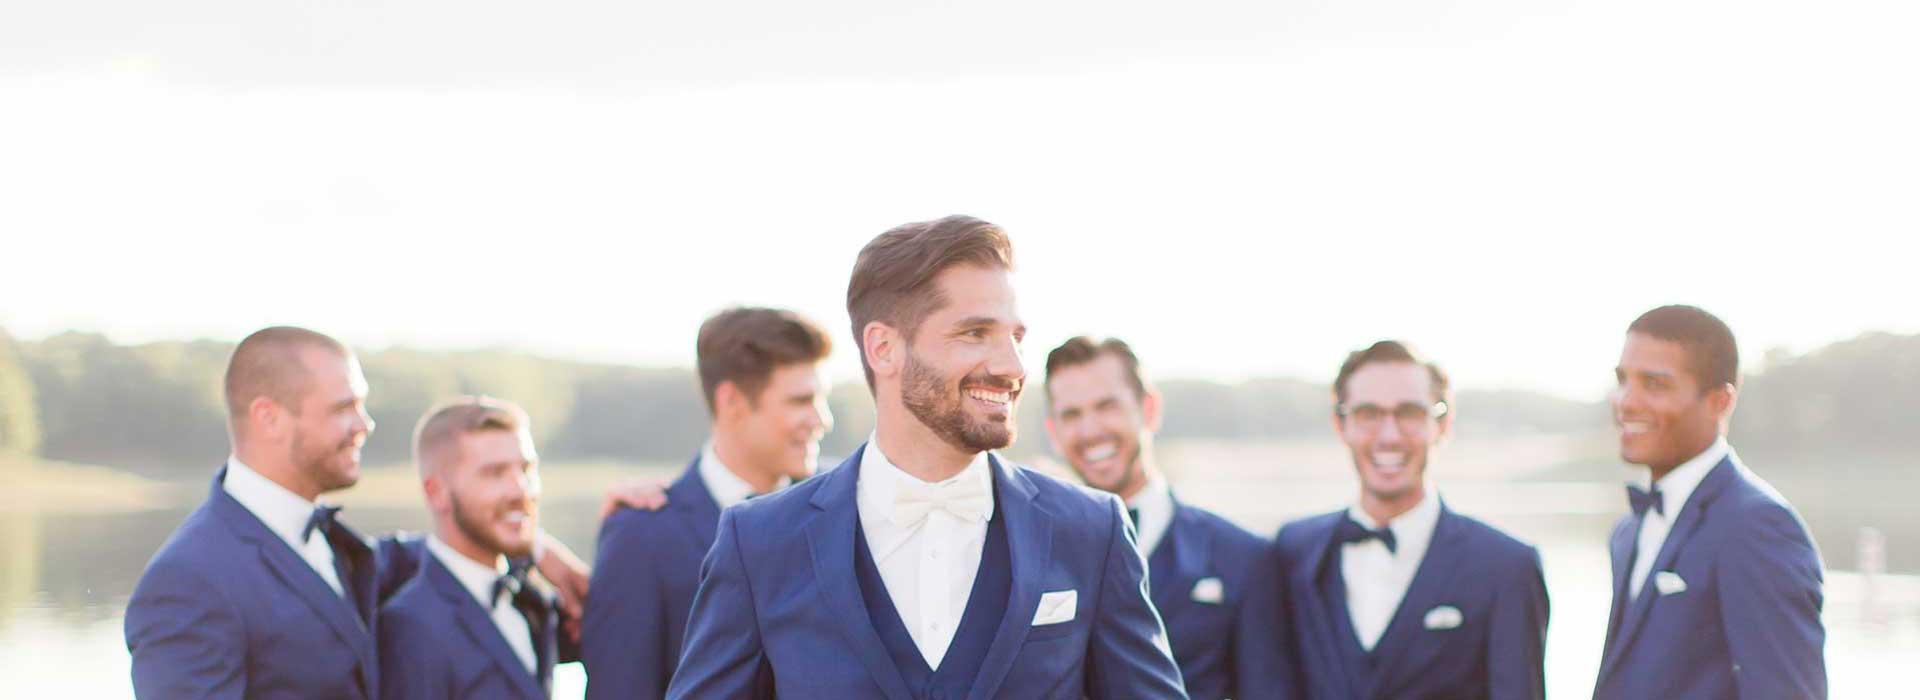 newest attractivedesigns cheaper Tuxedo & Suit Rentals | Savvi Formalwear